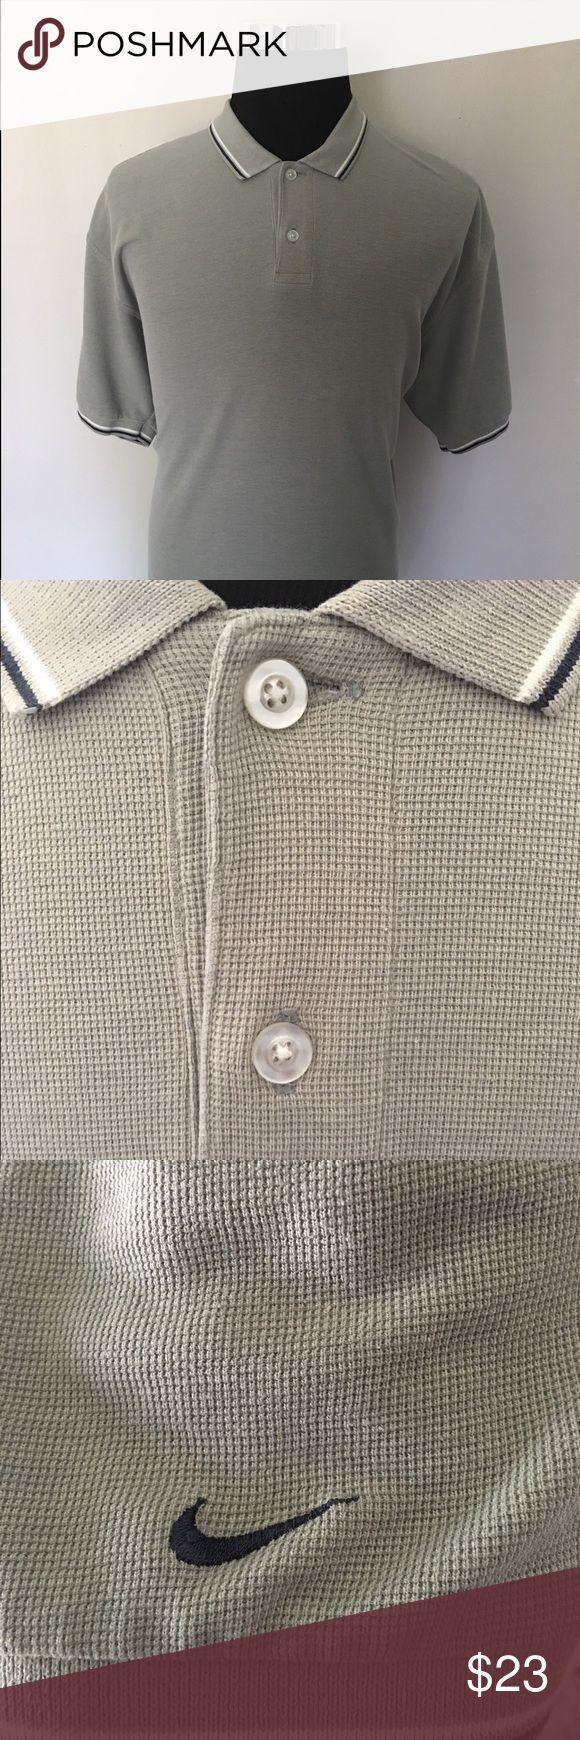 Nike Golf Men's Polo Good Condition - Size XL - Nike Logo On The Left Sleeve - Color: Gray Nike Shirts Polos